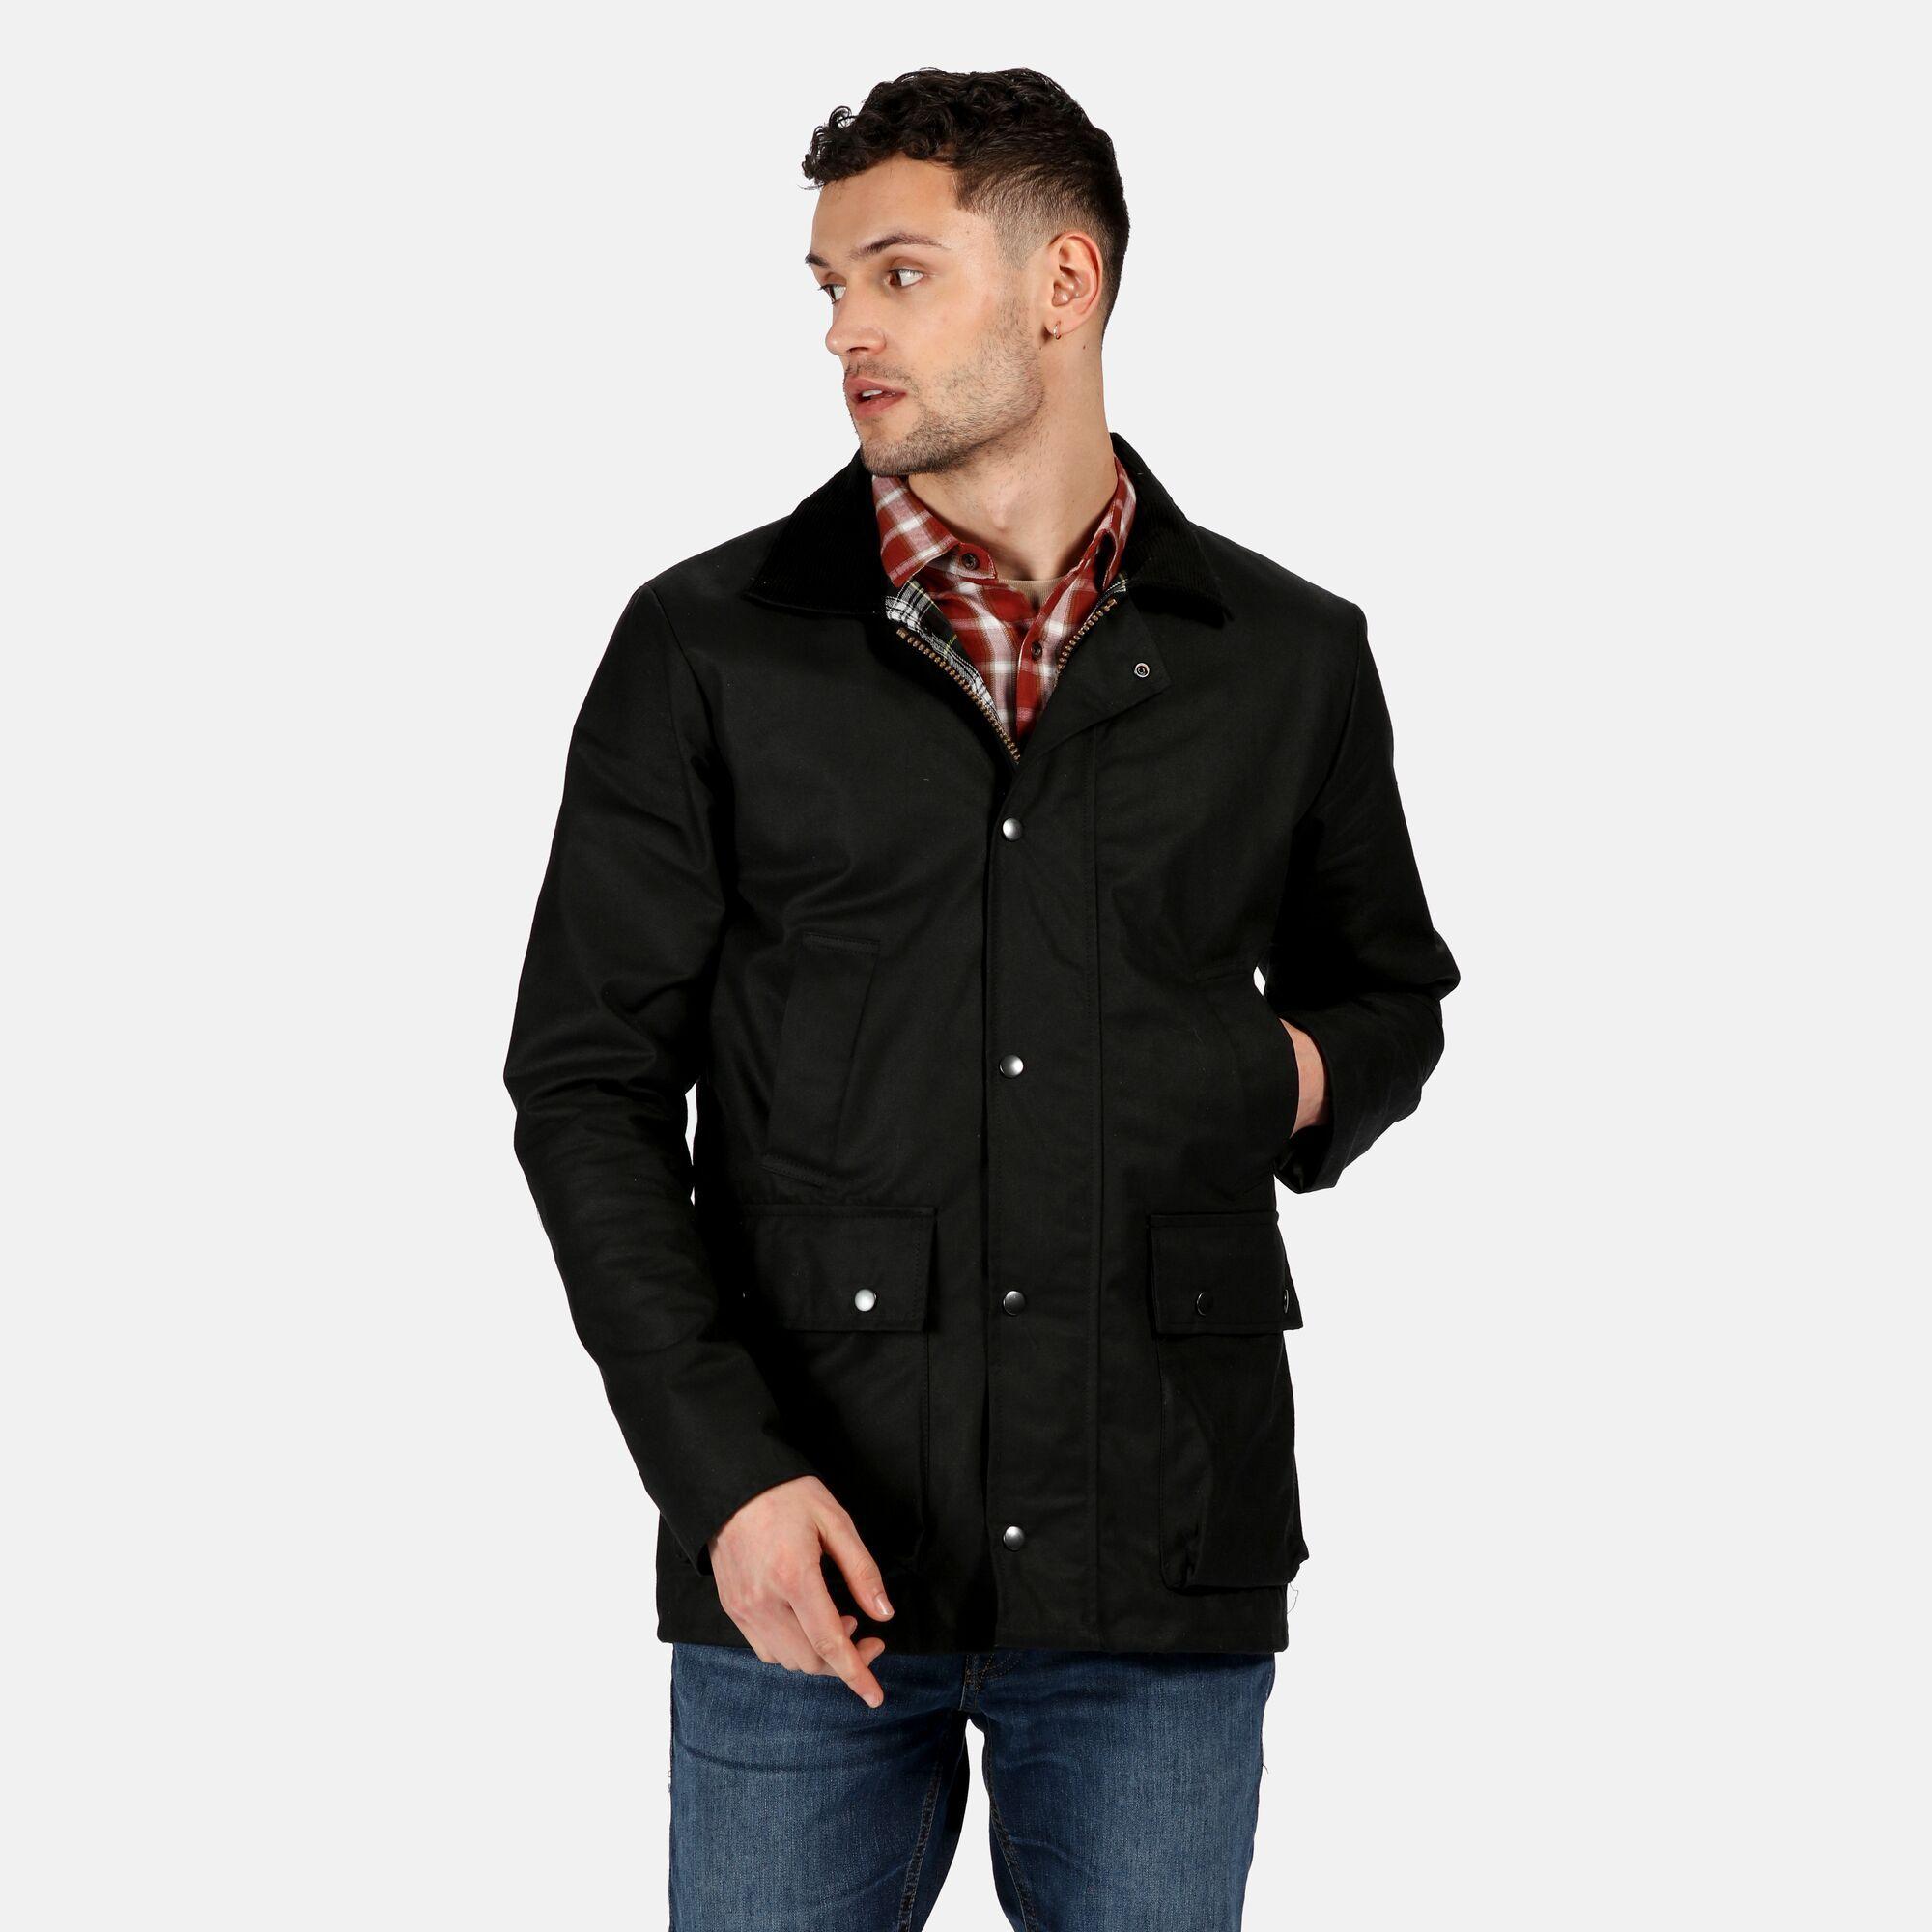 Regatta Mens Country Wax Jacket (Black)